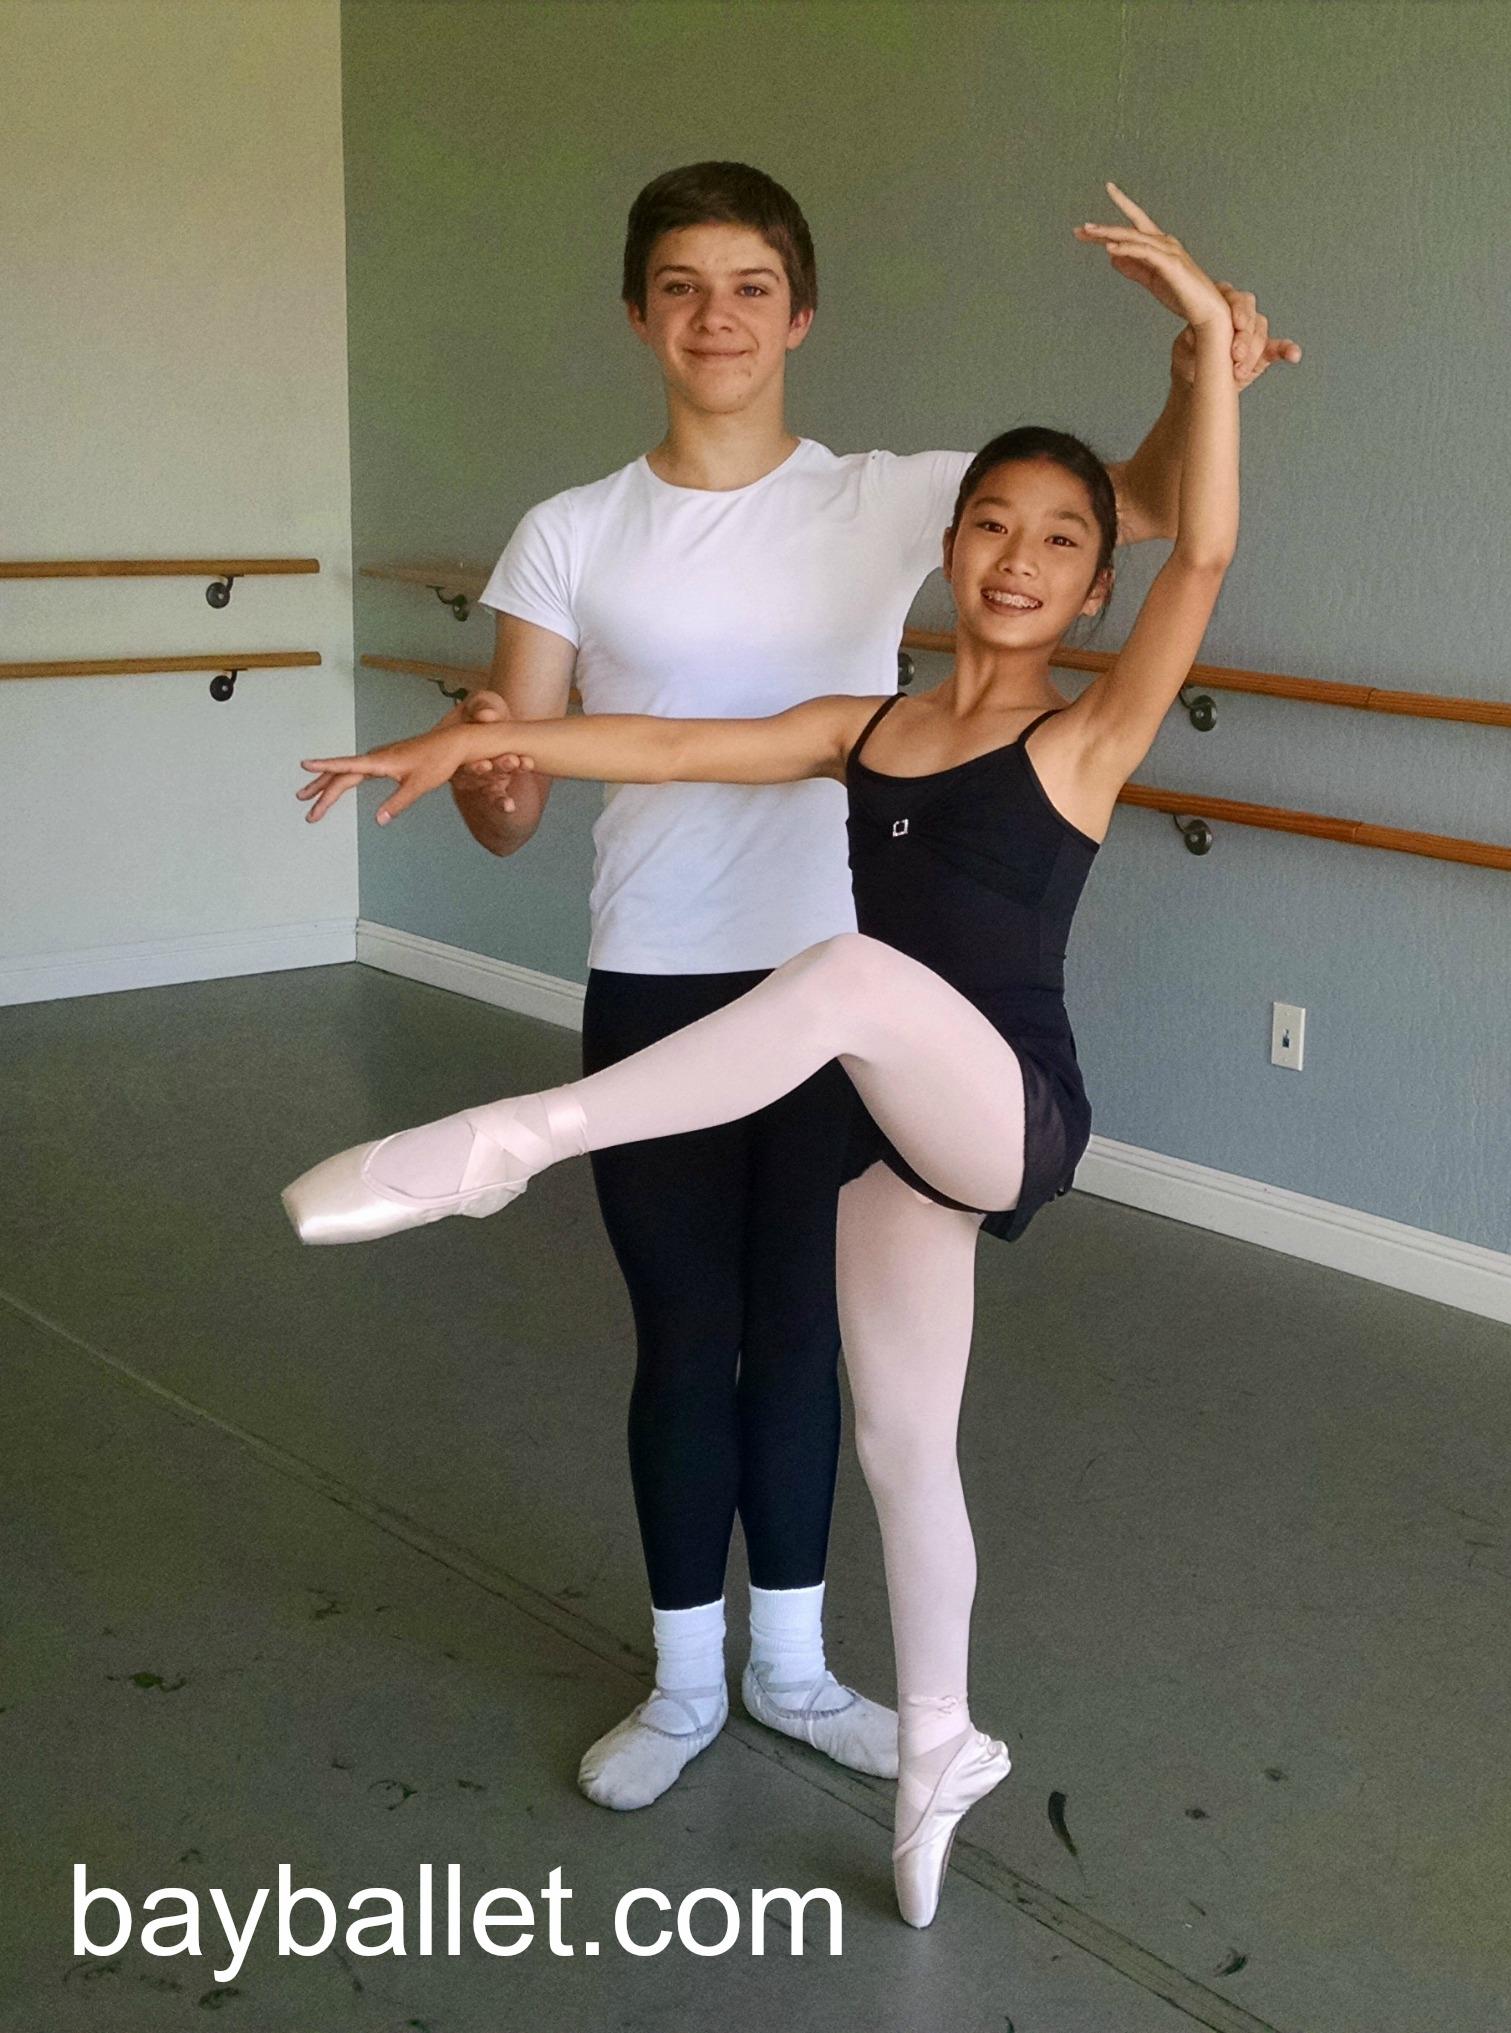 Bay_Ballet_Academy_San_Jose_Willow_Glen_Maximo_Califano_Dance_Classes_Jazz_Lyrical_Hip_Hop_Modern_Neoclassical_Class_10